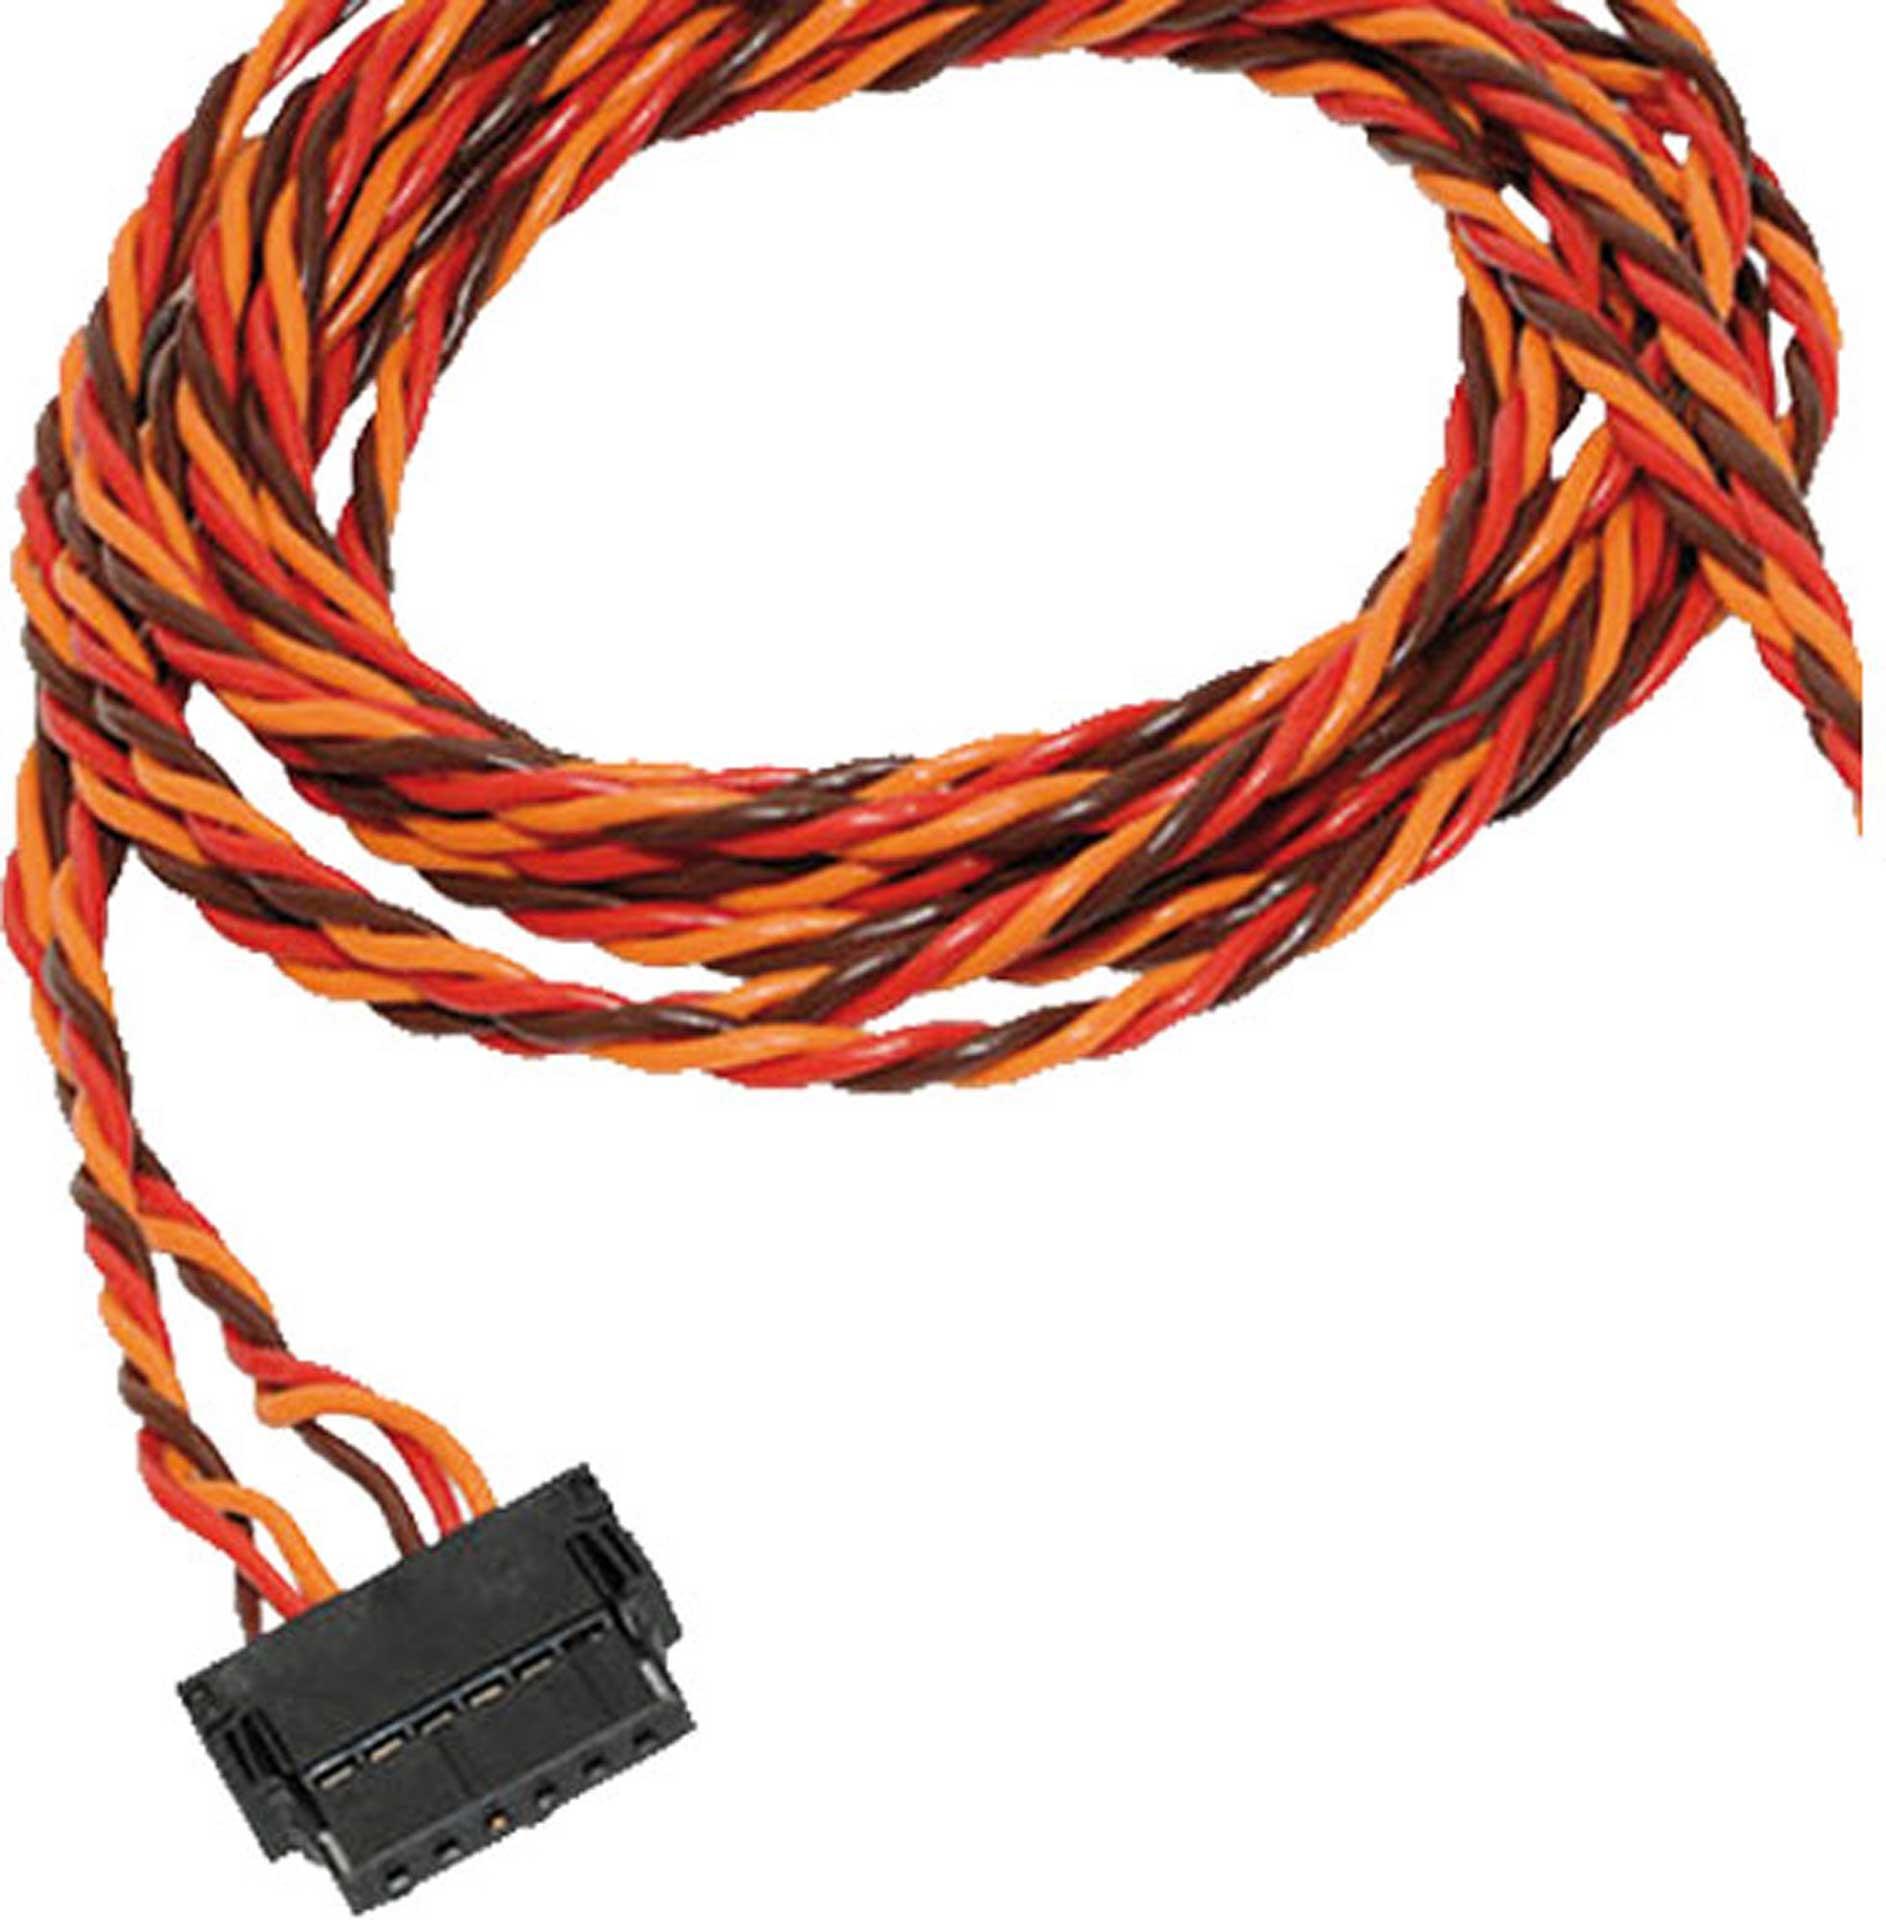 EMCOTEC WING CONNECTOR EWC6 ANSCHLUSSKABEL 200CM